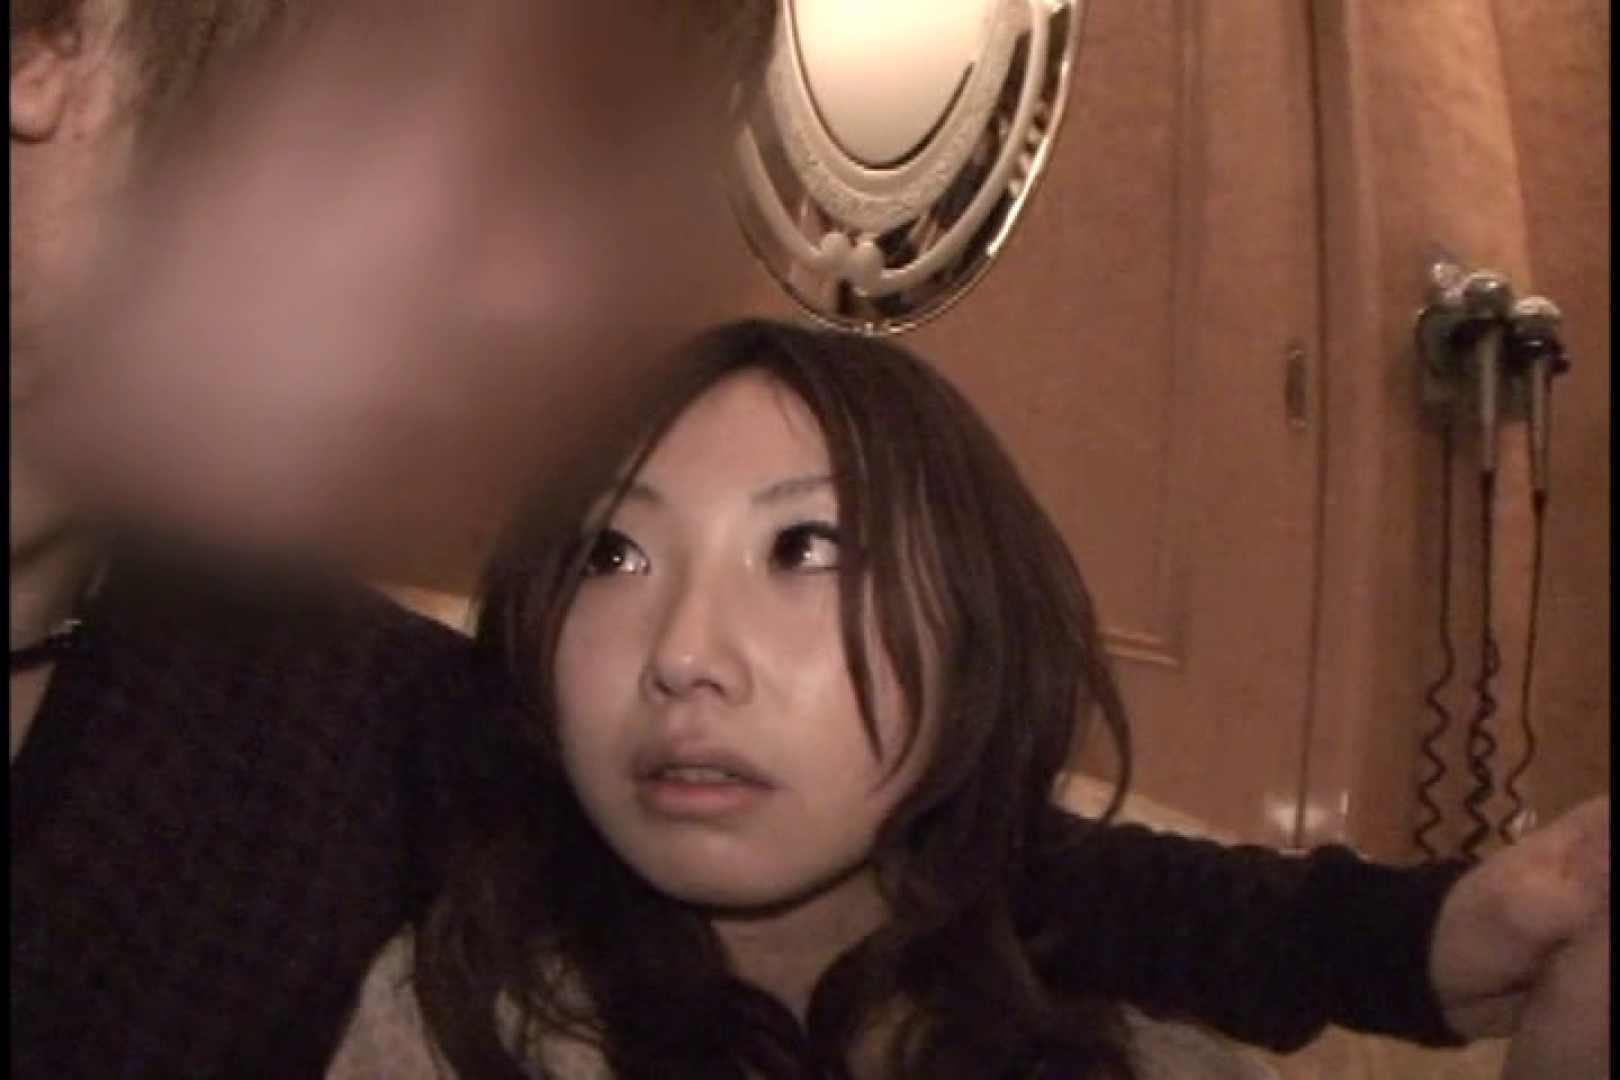 JDハンター全国ツアー vol.041 前編 女子大生のエロ動画   0  85PIX 37